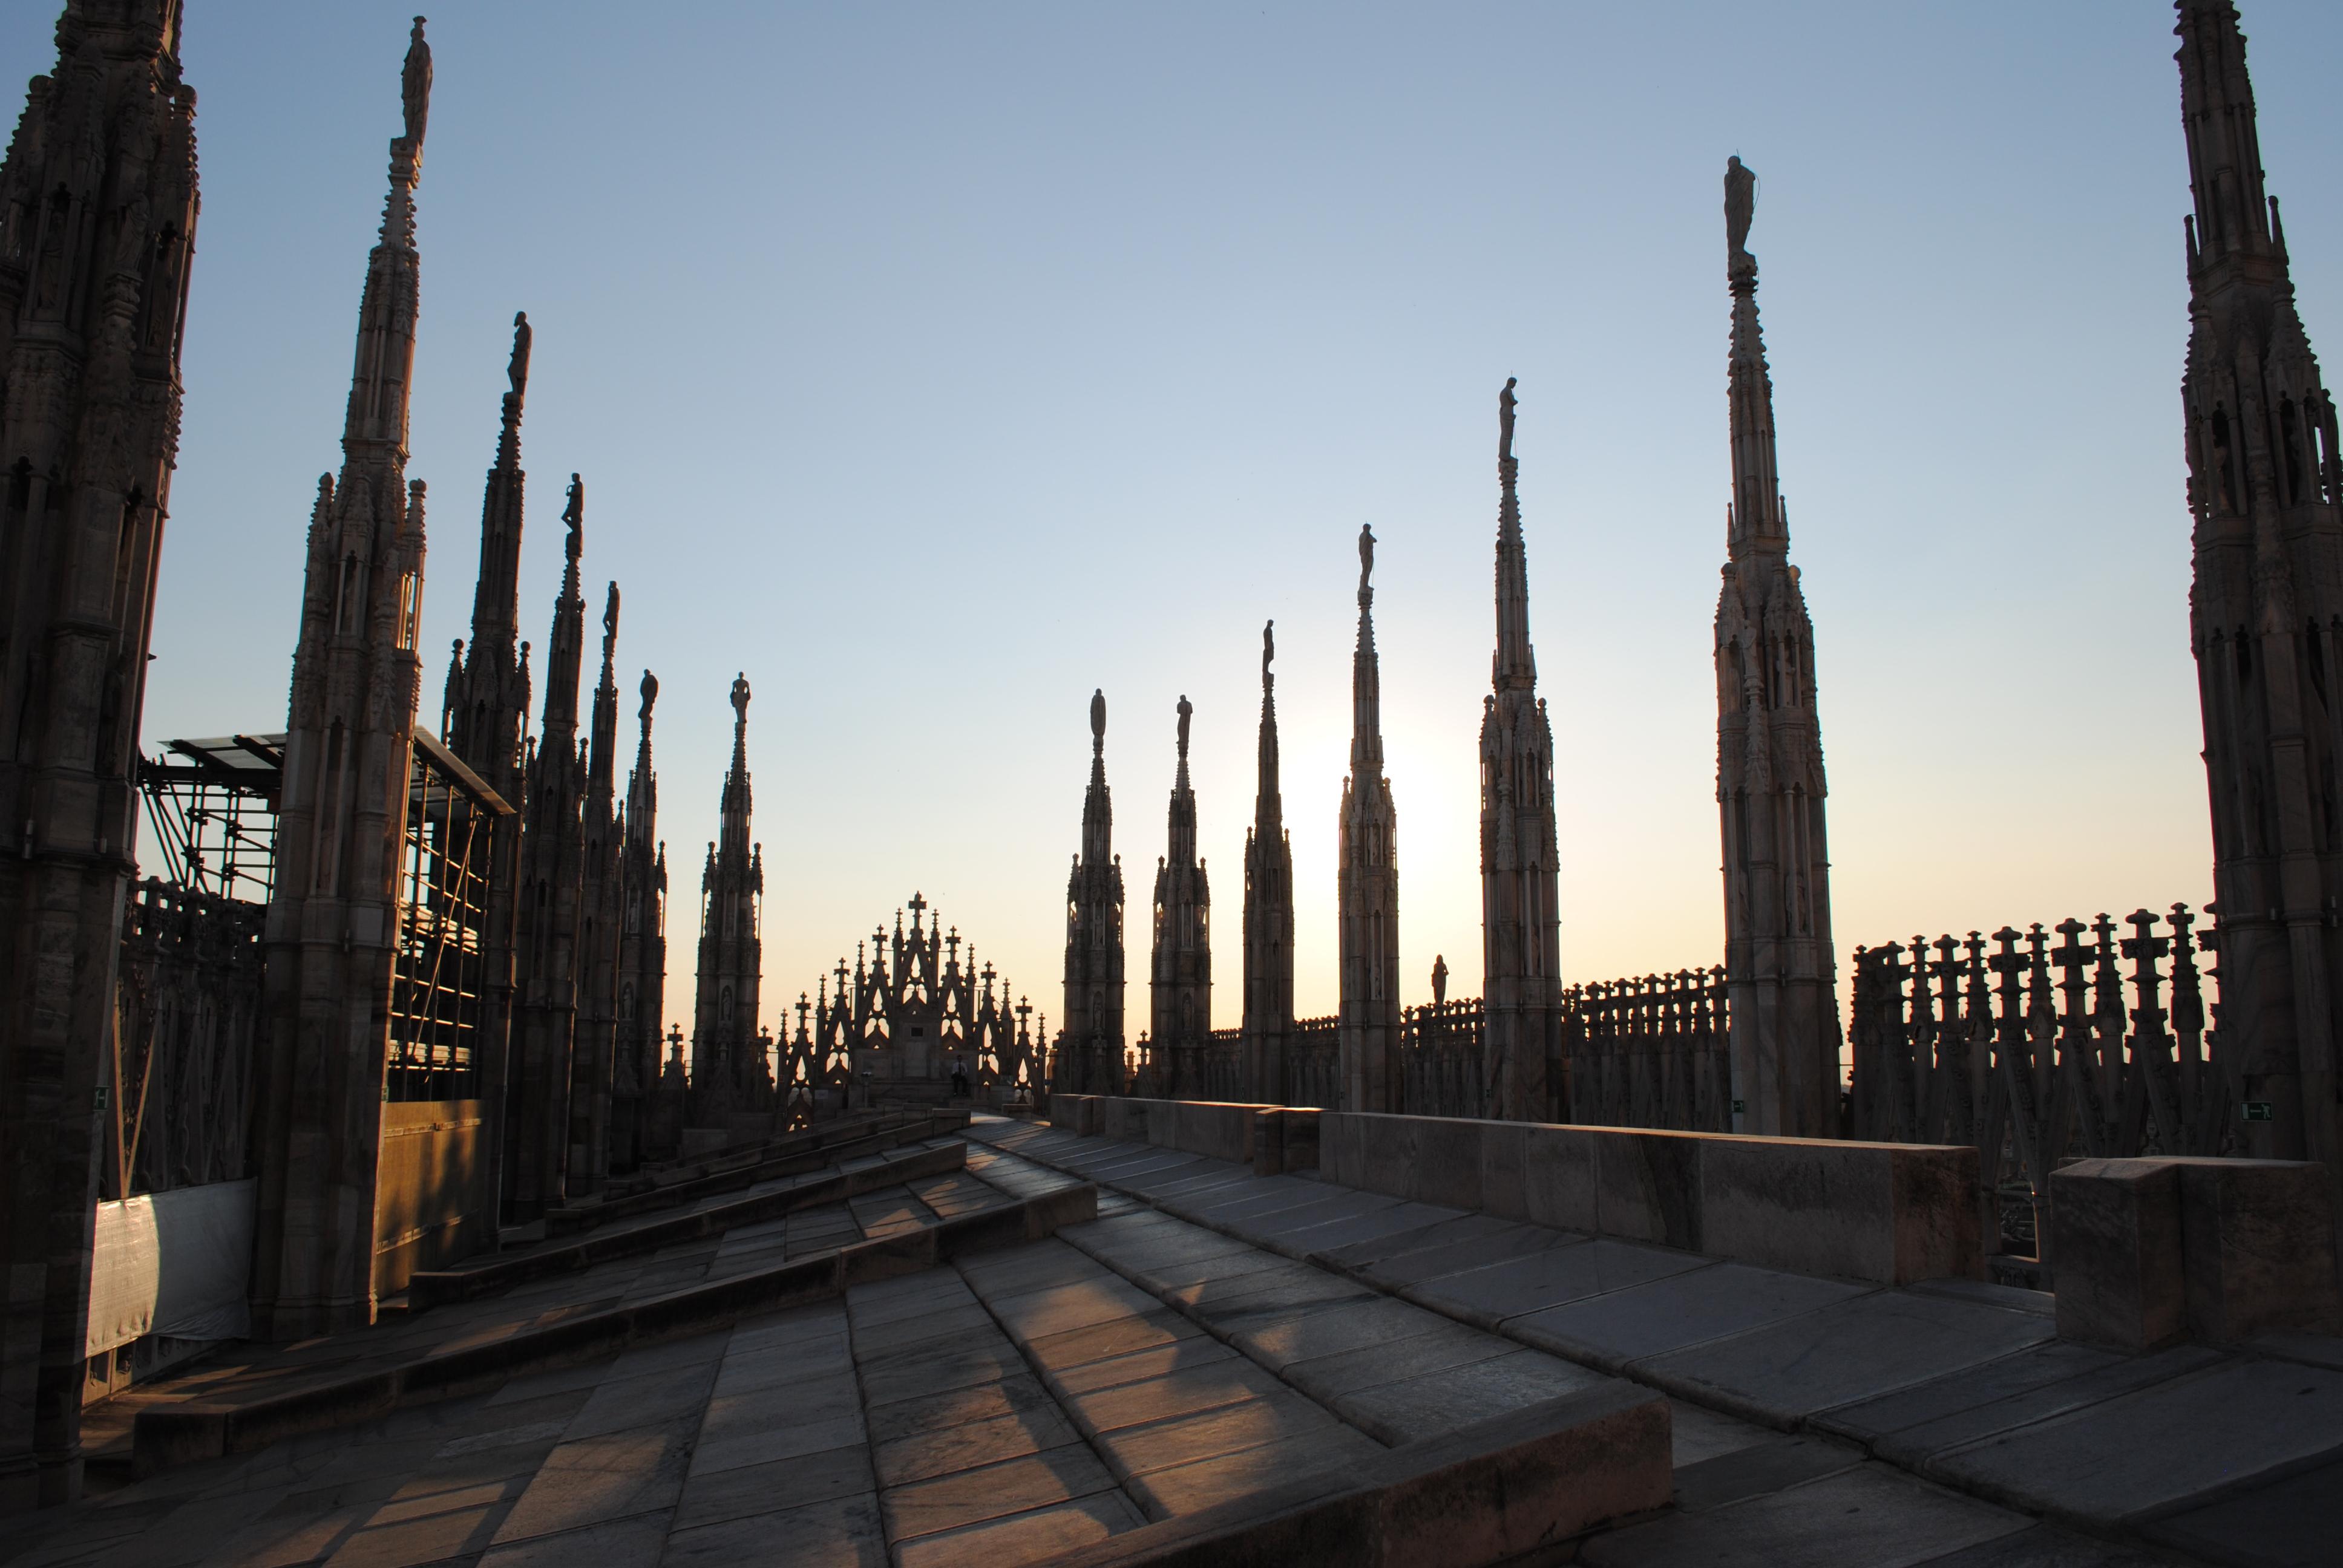 Perchè Salire Sul Duomo Di Milano Di Qua E Di Là Blog Di